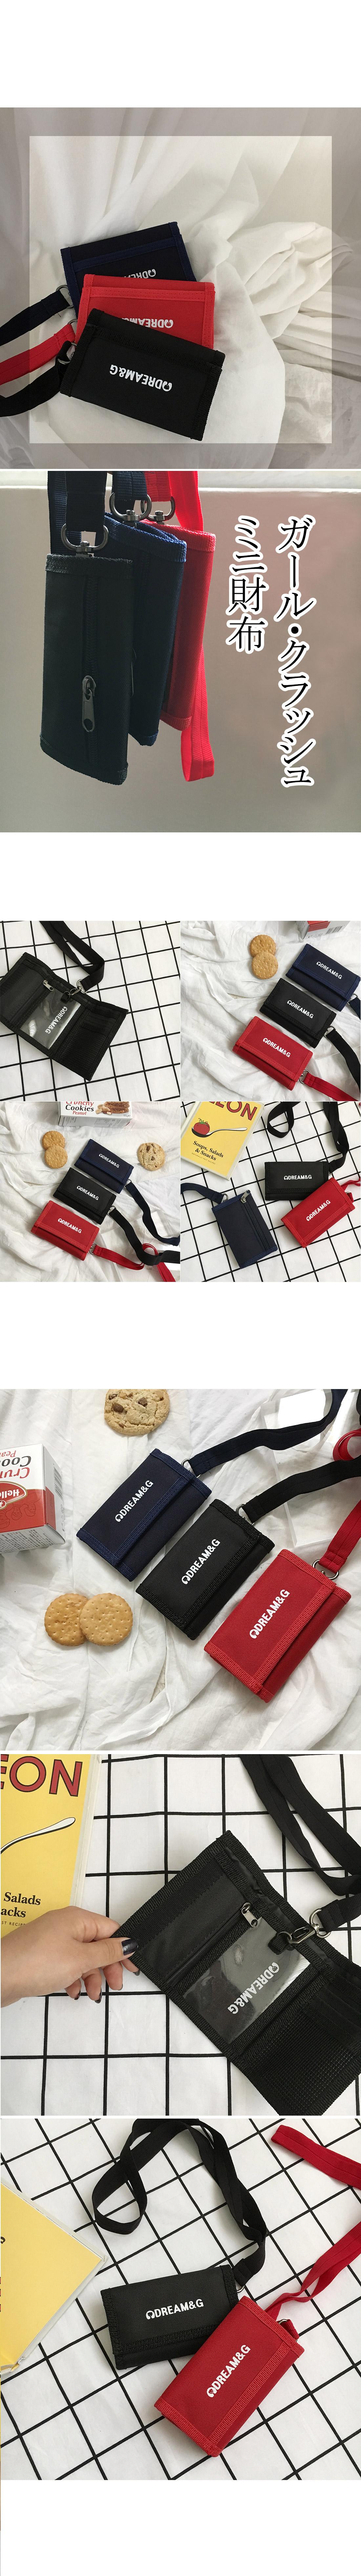 2c4d90c308c3 ガール・クラッシュミニ財布 - 激安カジュアルファッション通販 ...